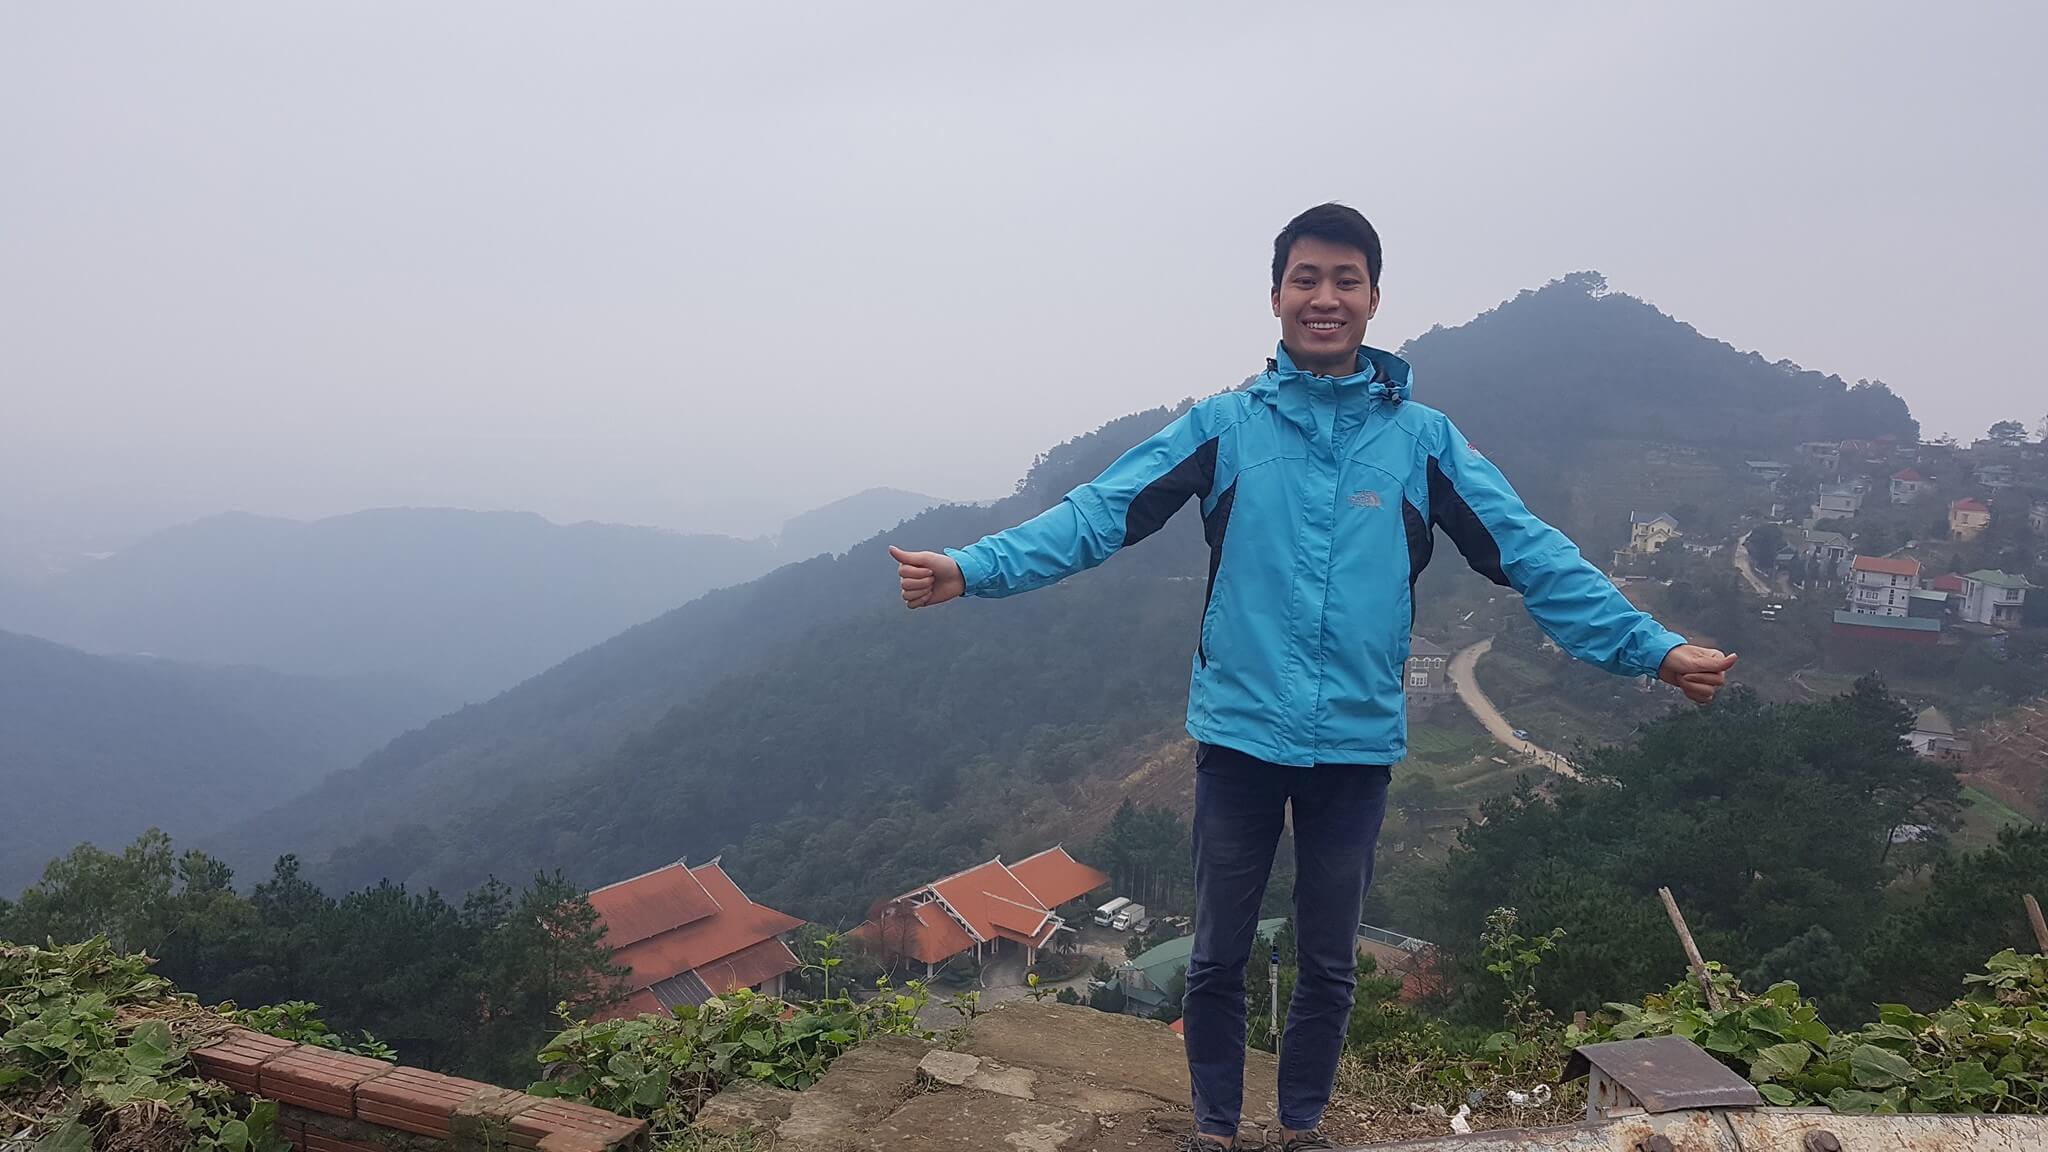 Blogger Phạm Anh Quang